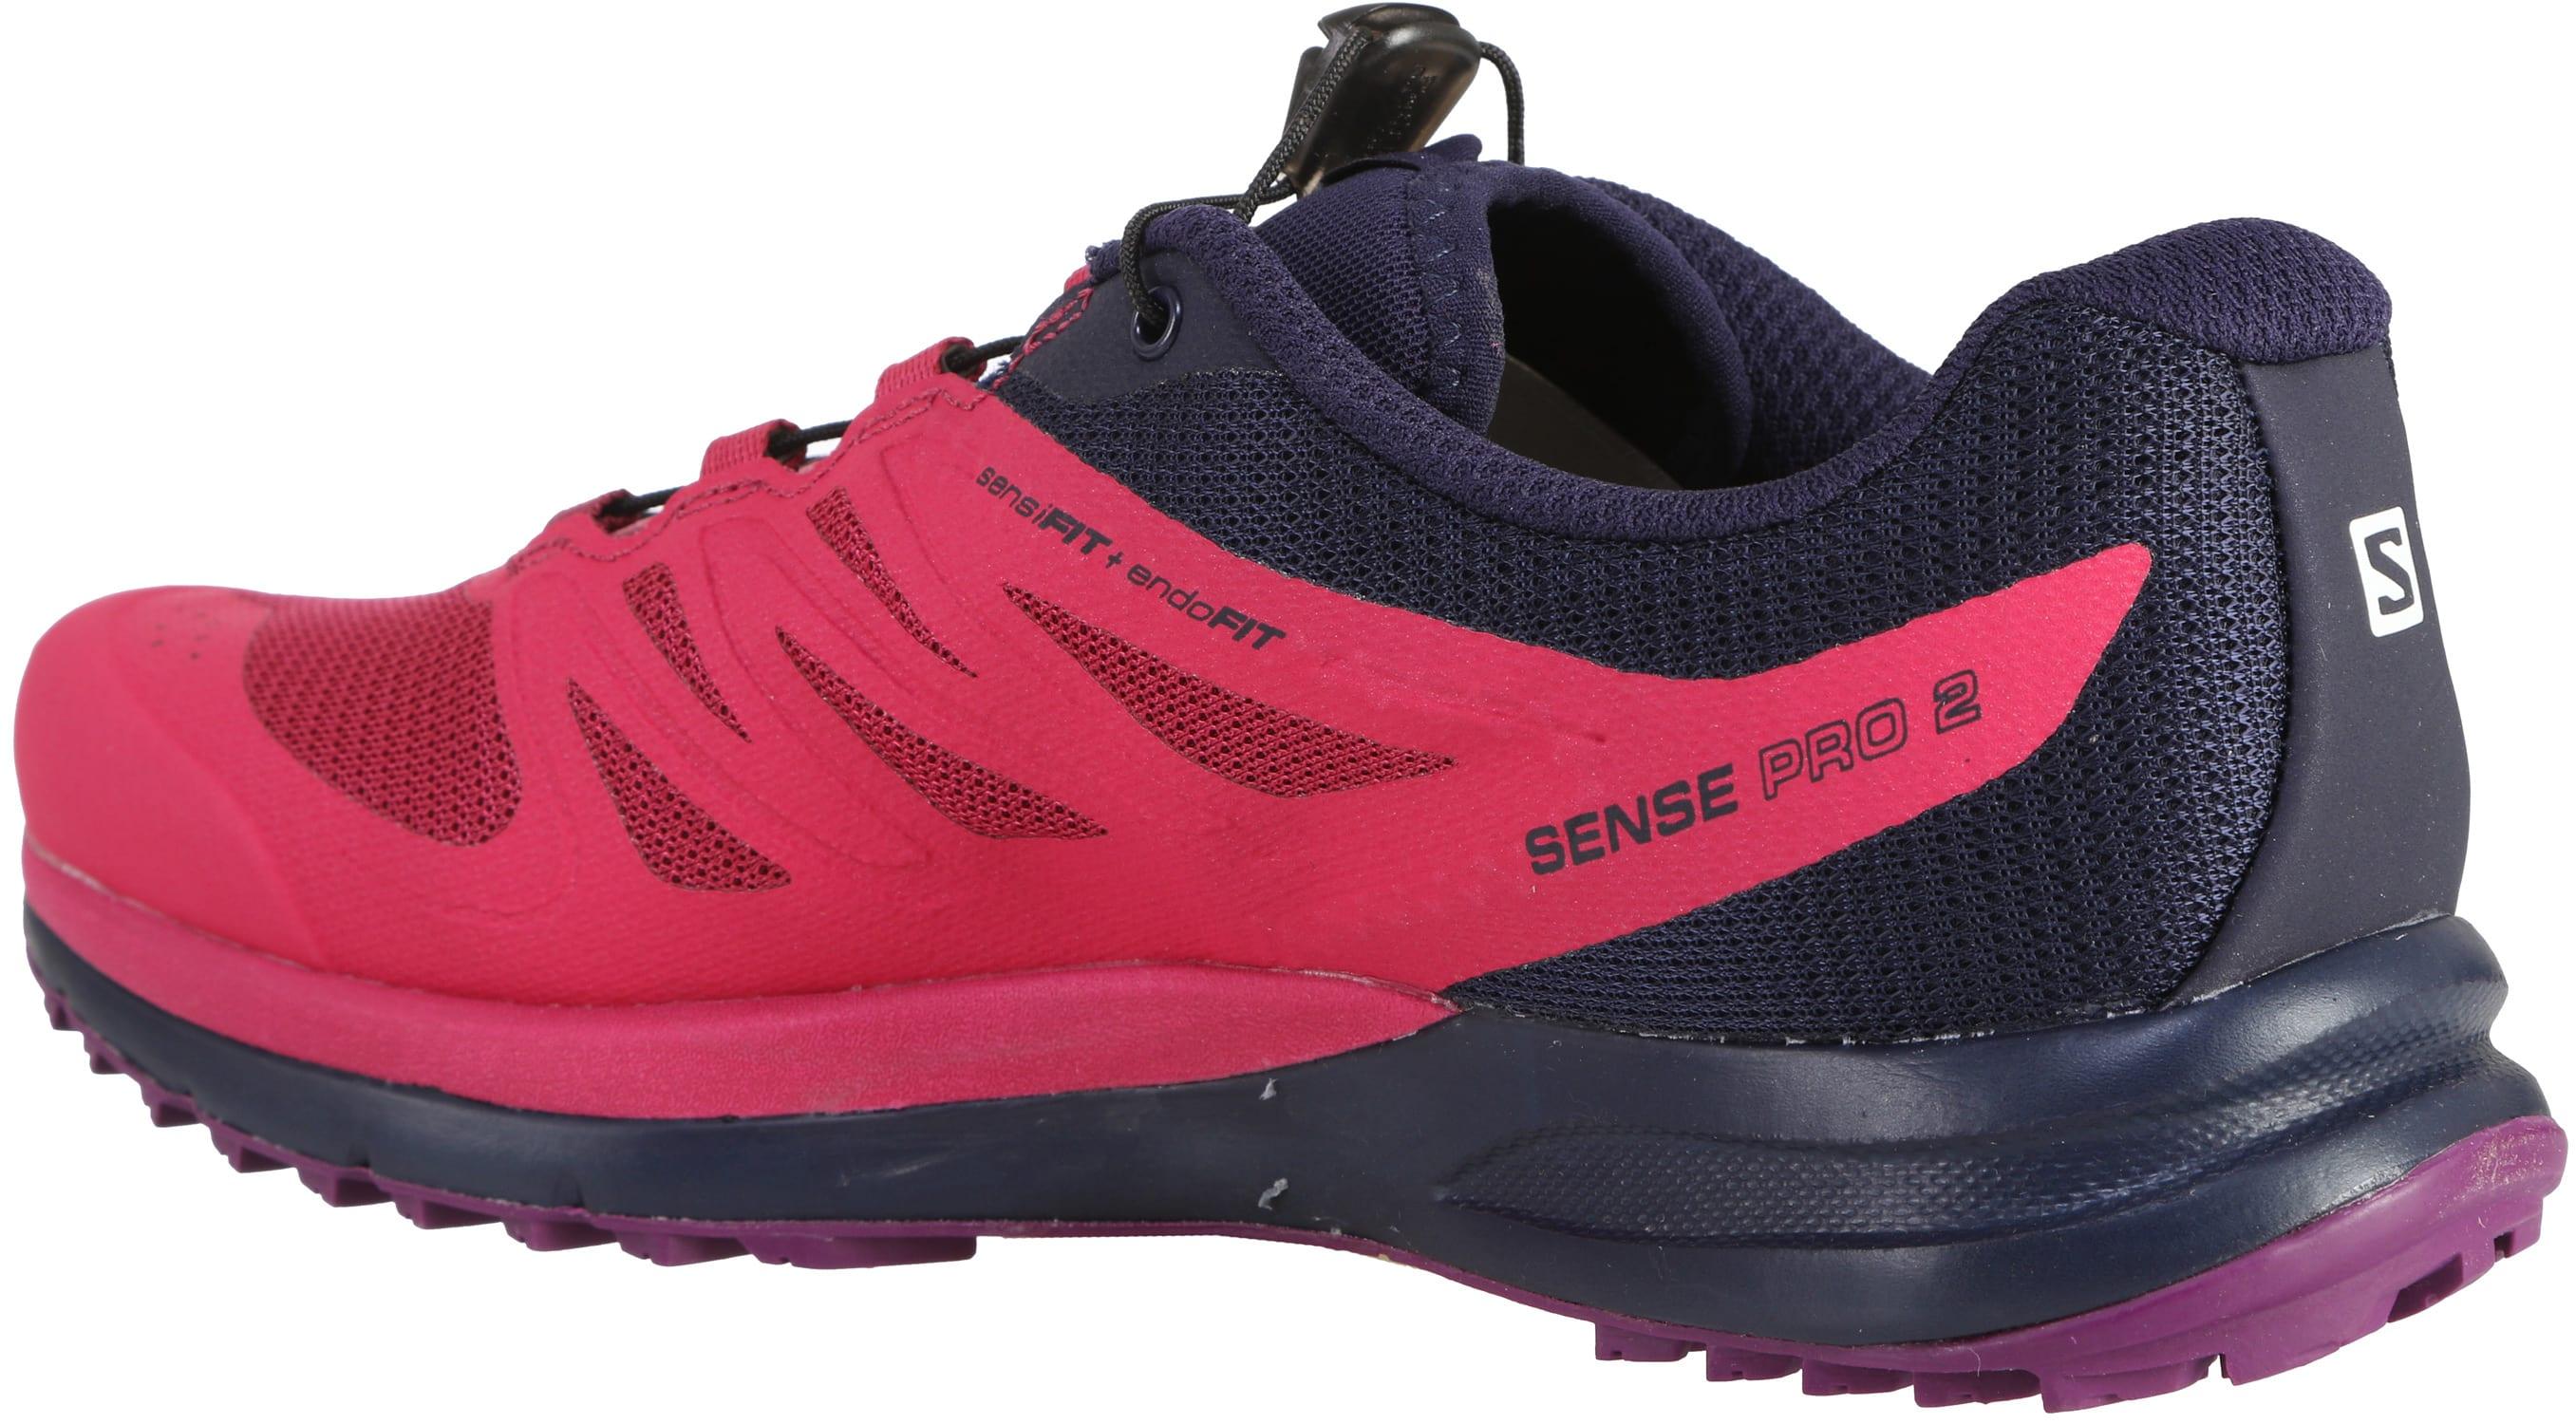 on sale salomon sense pro 2 shoes womens up to 40 off. Black Bedroom Furniture Sets. Home Design Ideas